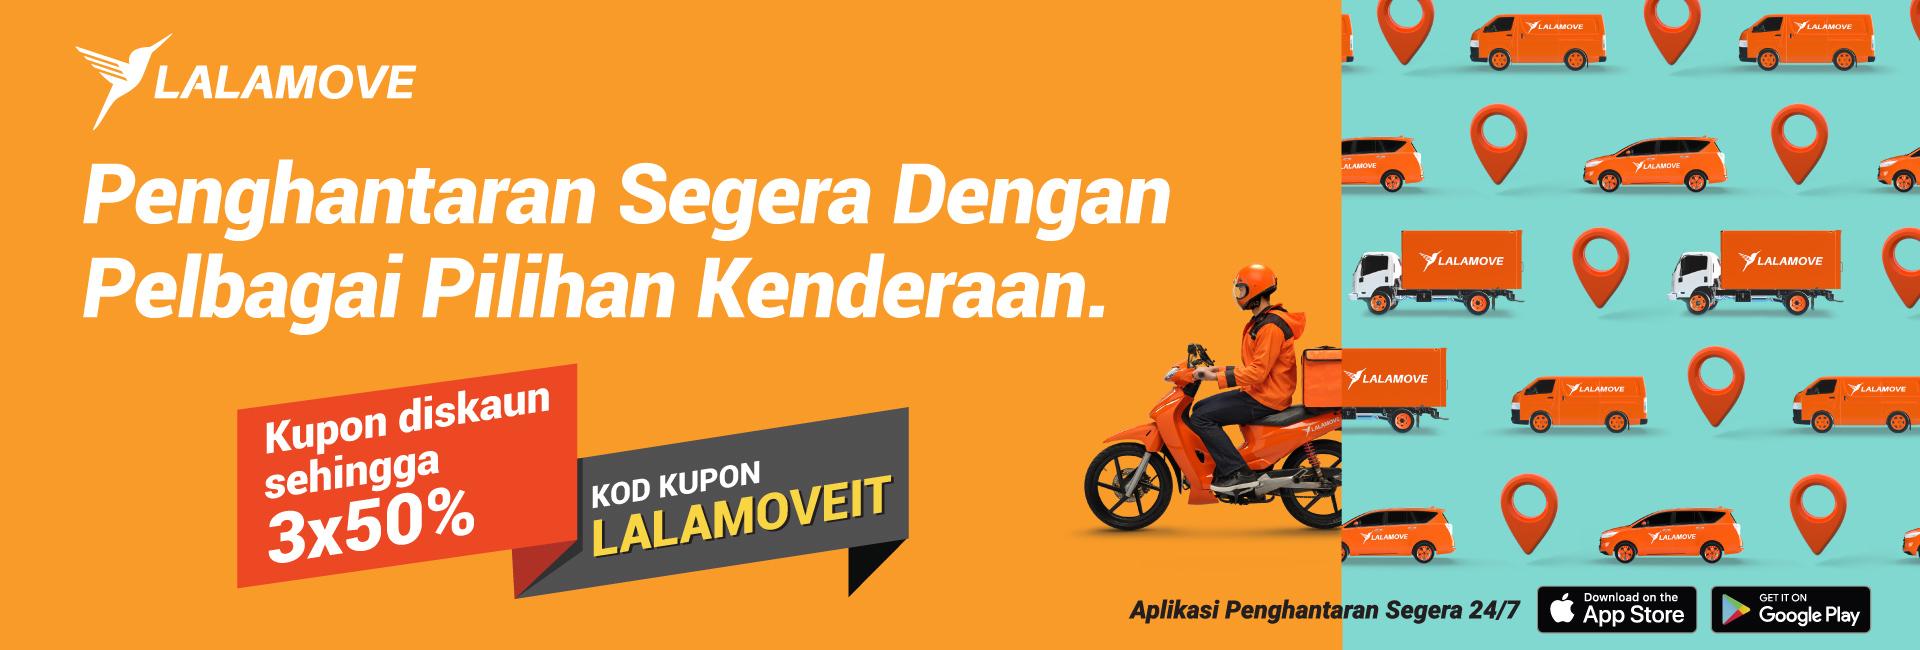 Lets Lalamove It Malay